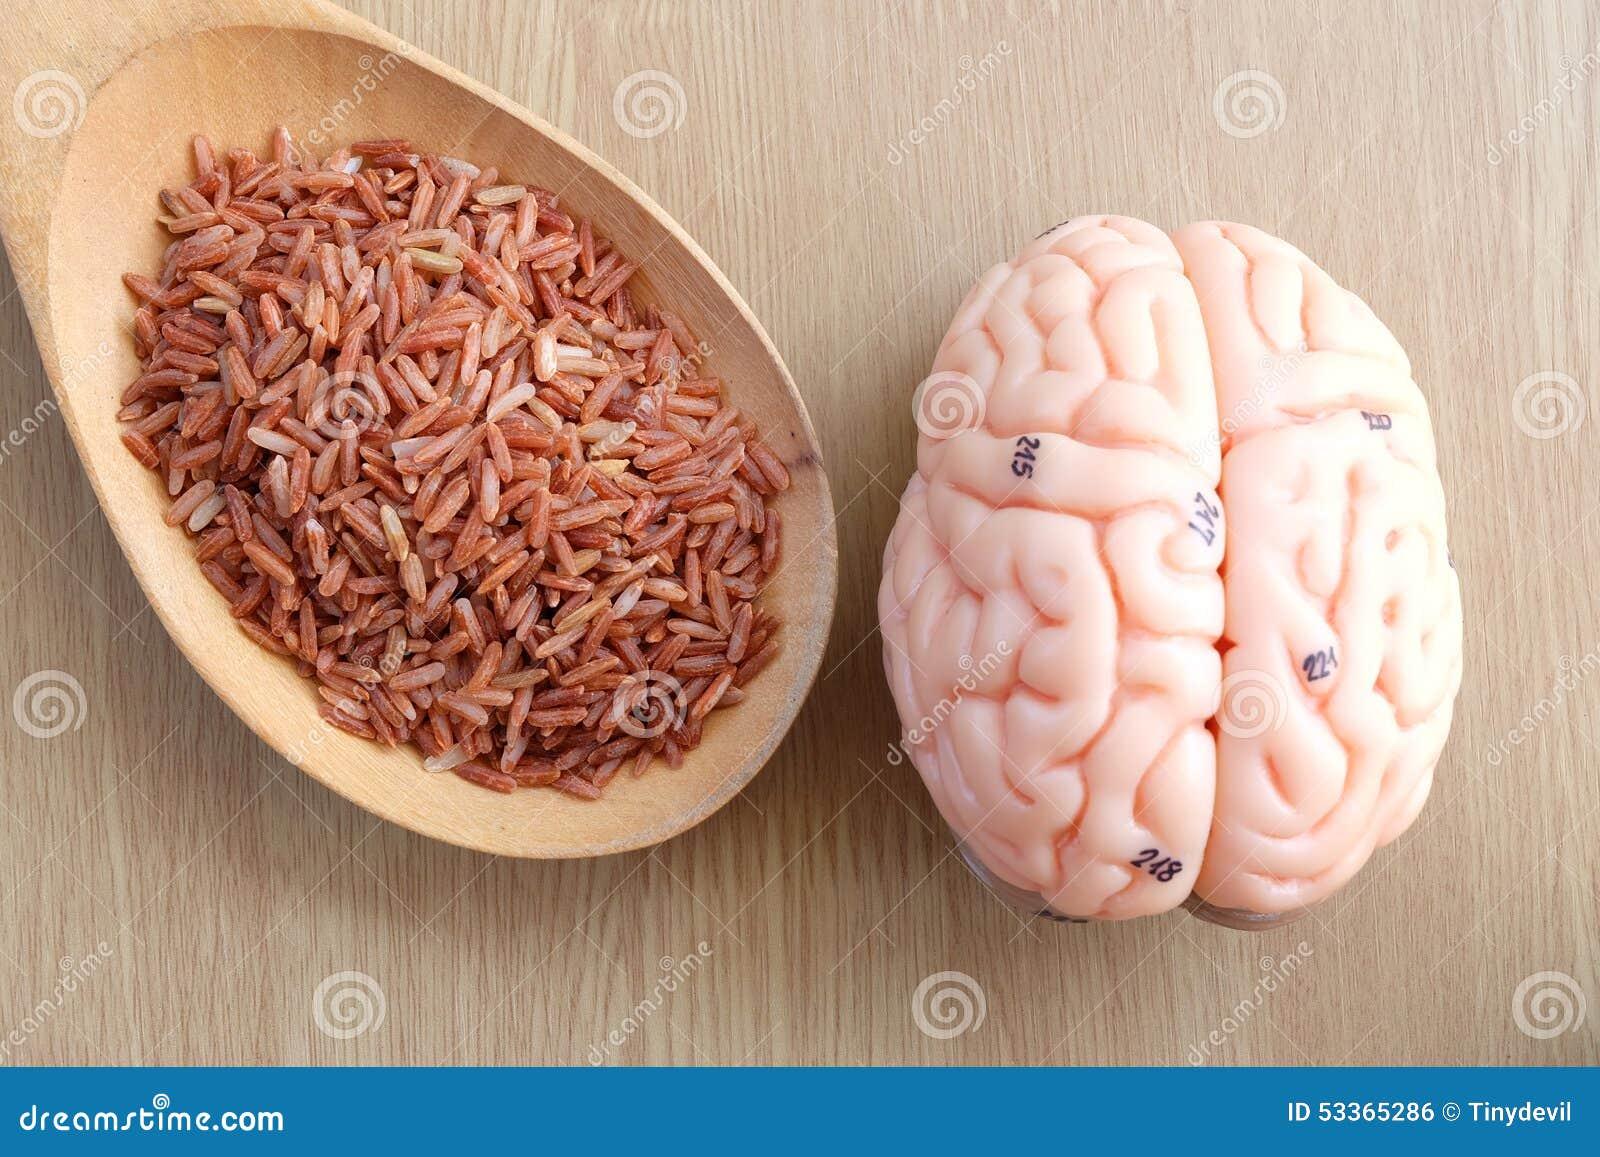 Human brain model stock photo. Image of brain, memory - 53365286